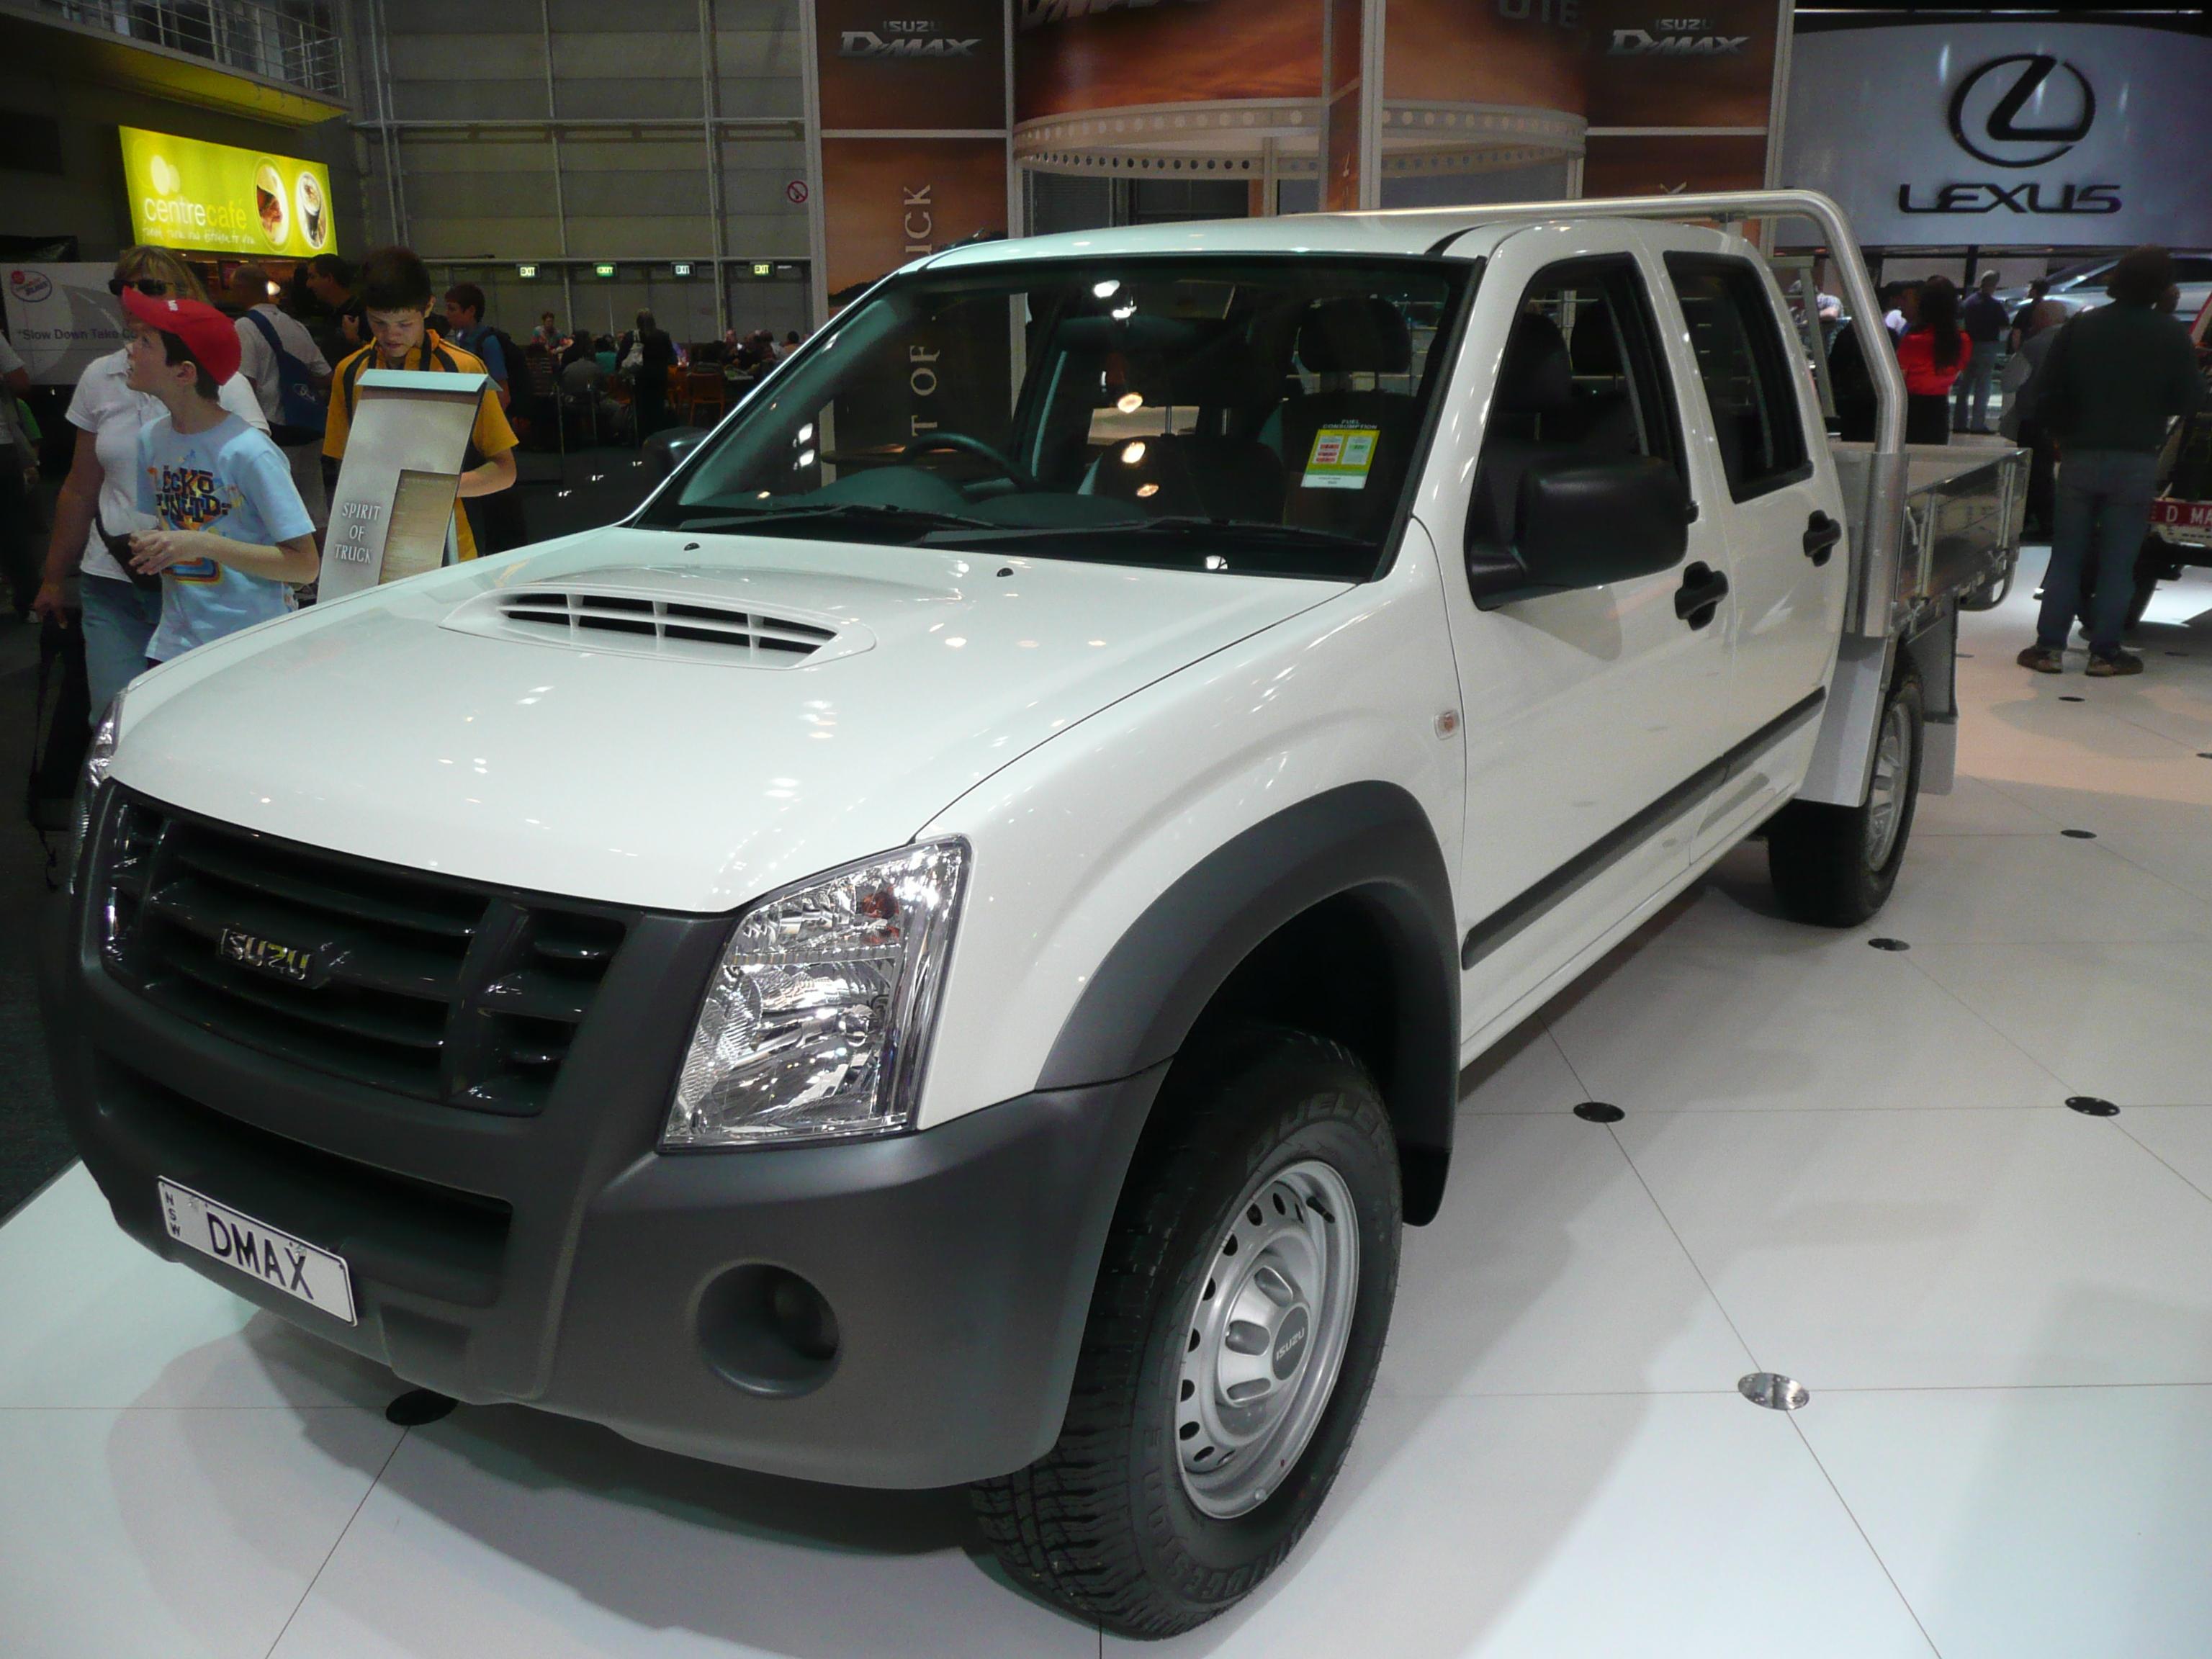 file:2008 isuzu d-max sx 4-door cab chassis 01 - wikimedia commons